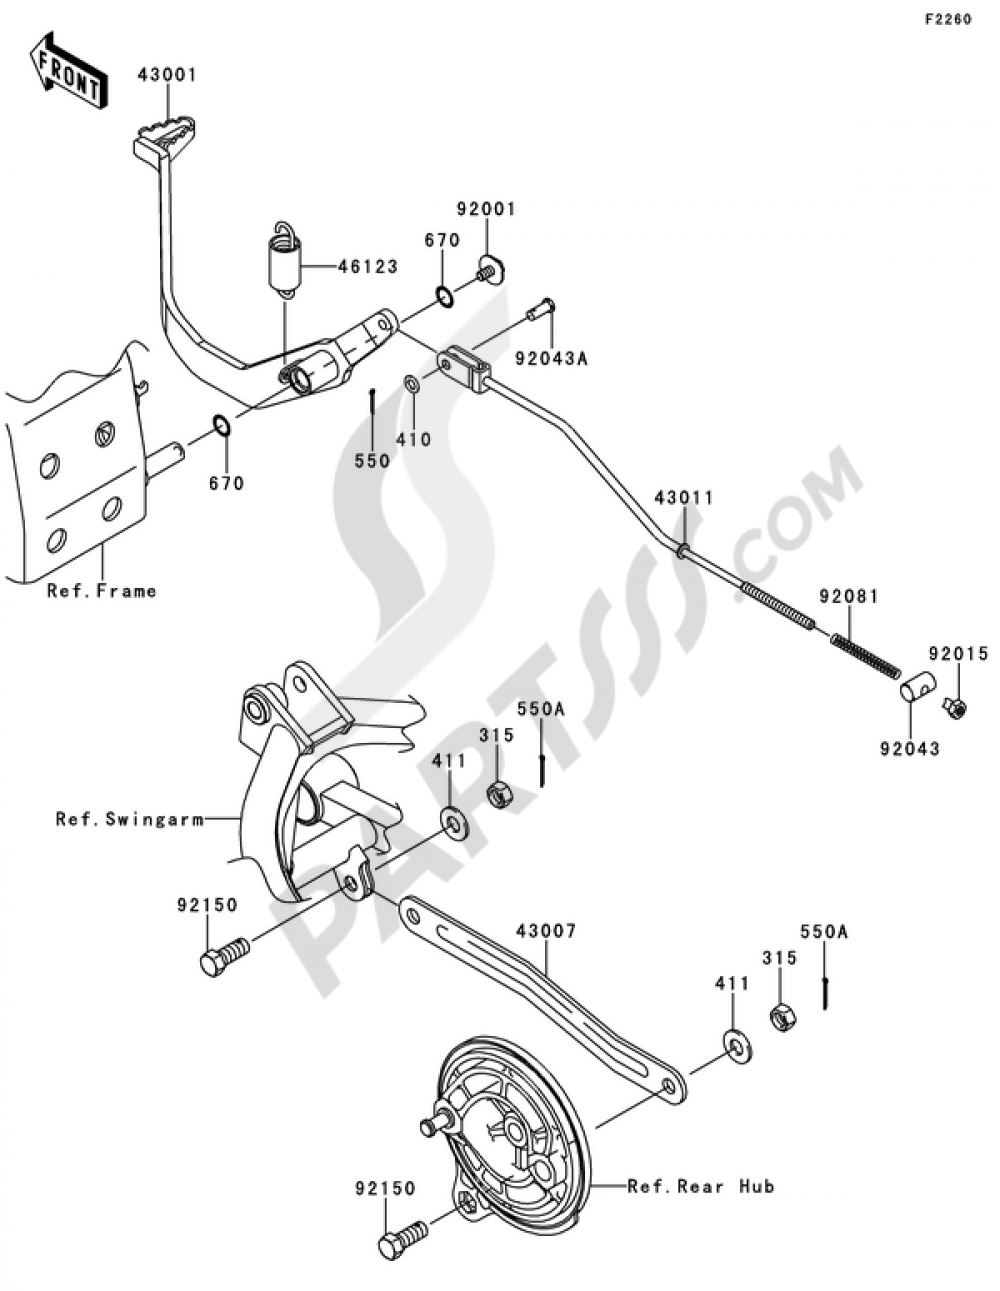 Kawasaki Klx 110 Wiring Diagram - Catalogue of Schemas on